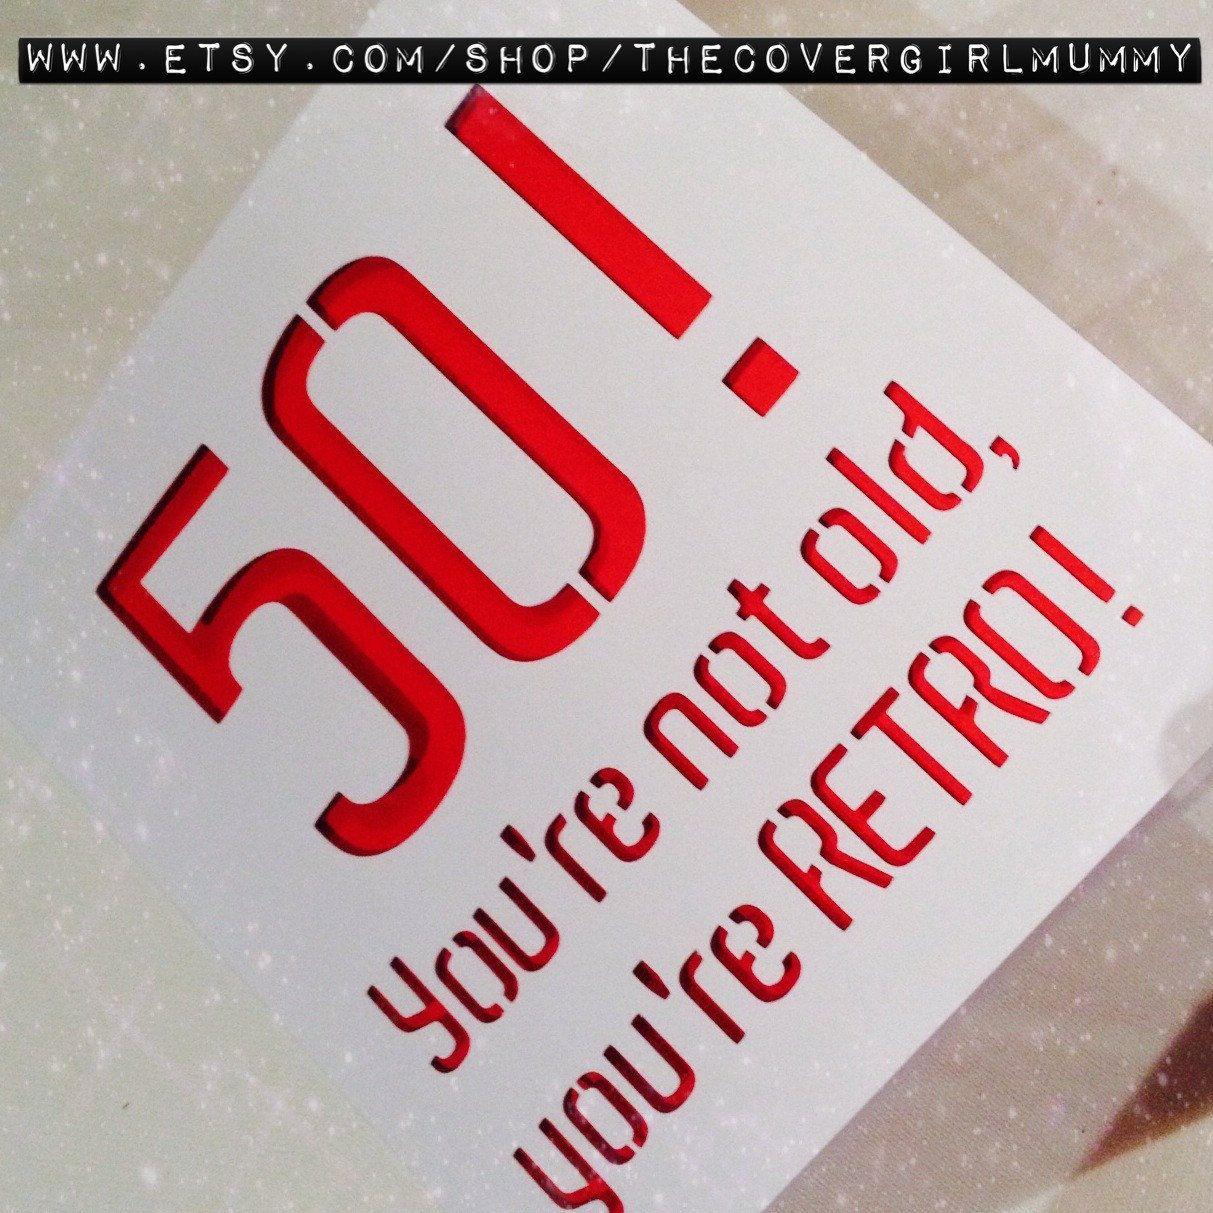 50th birthday card 50th birthday 50 birthday card 50 birthday 50th birthday card 50th birthday 50 birthday card 50 birthday age 50 card for him dad 50 dad birthday card birthday card him bookmarktalkfo Gallery